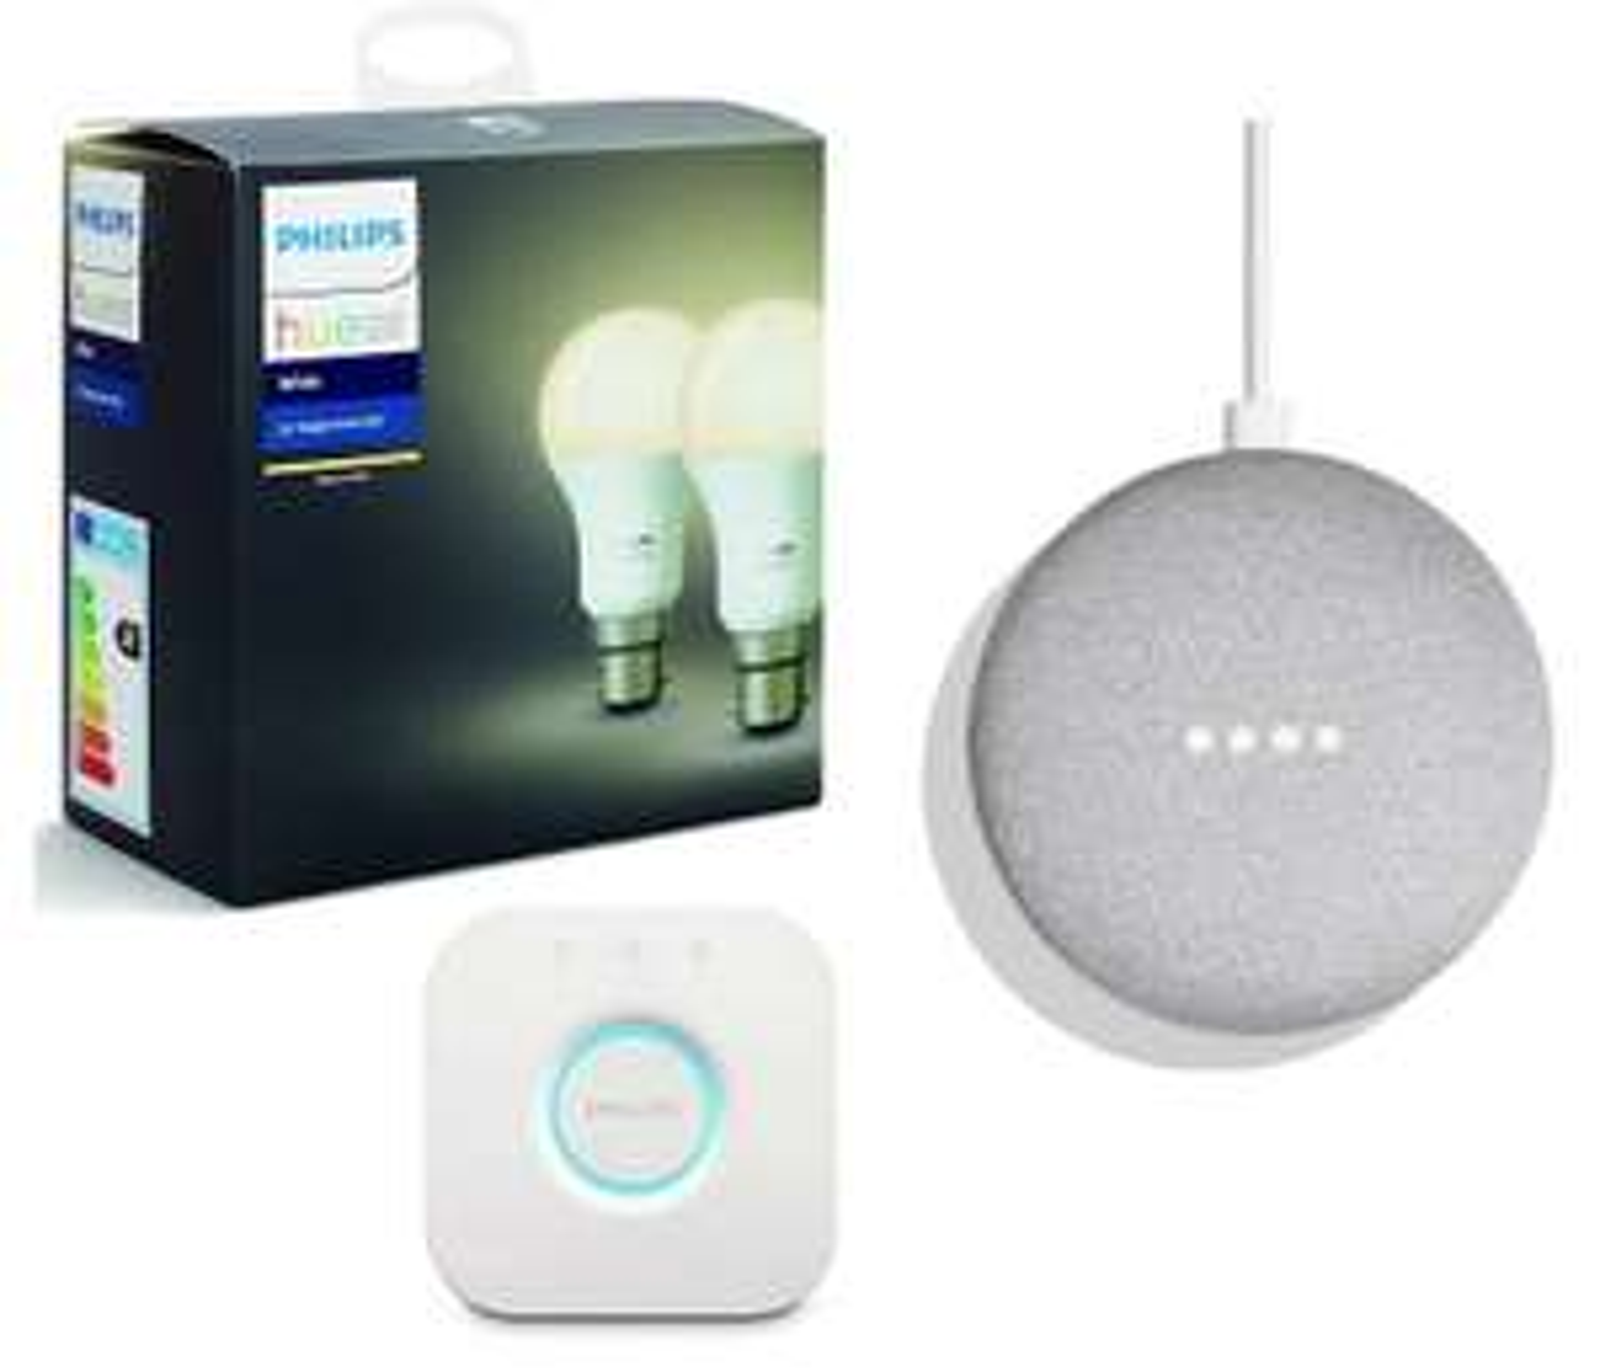 Philips Hue White B22 Starter Kit and Google Home Mini Speaker Chalk Bundle A £63.91 @  cheapest_electrical ebay